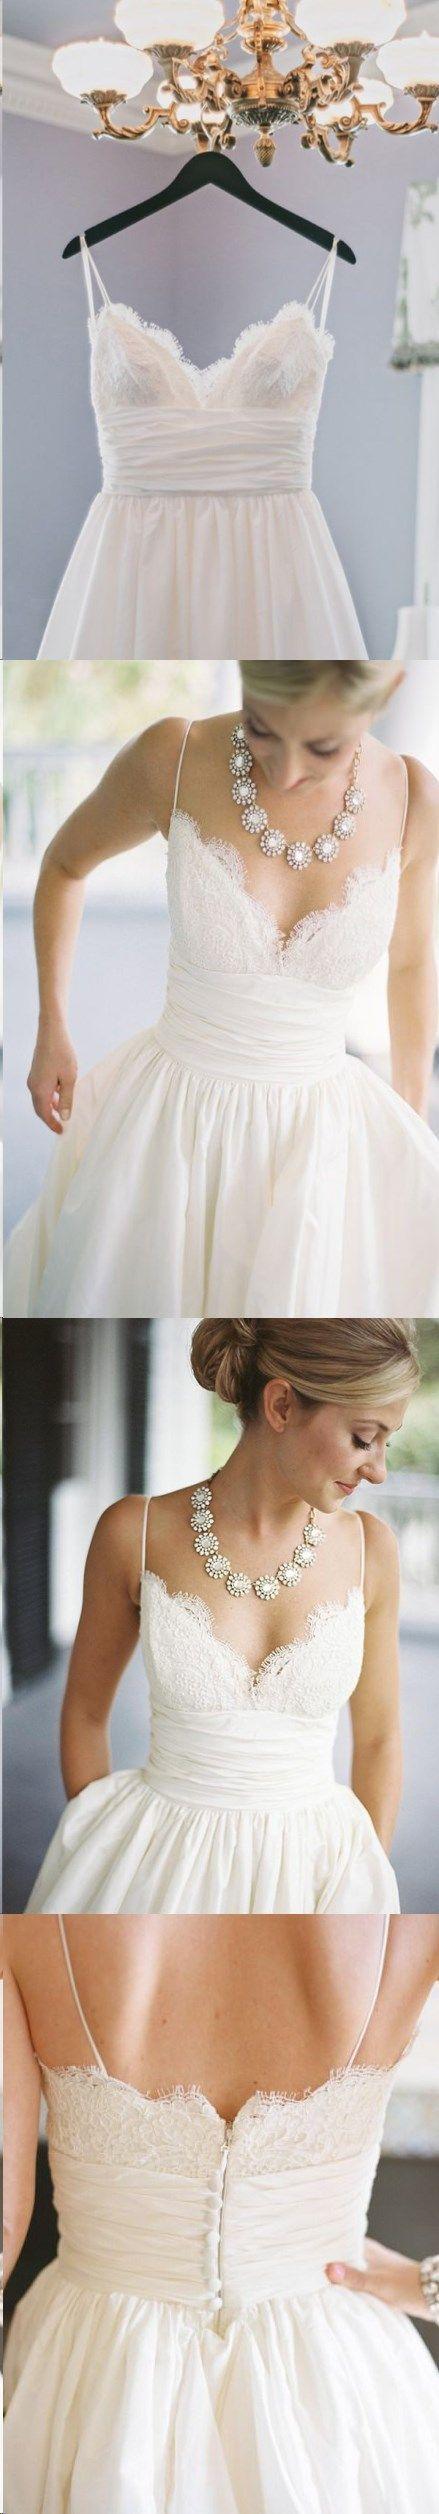 Beach Wedding Dresses Spaghetti Straps Sexy Bridal Gown